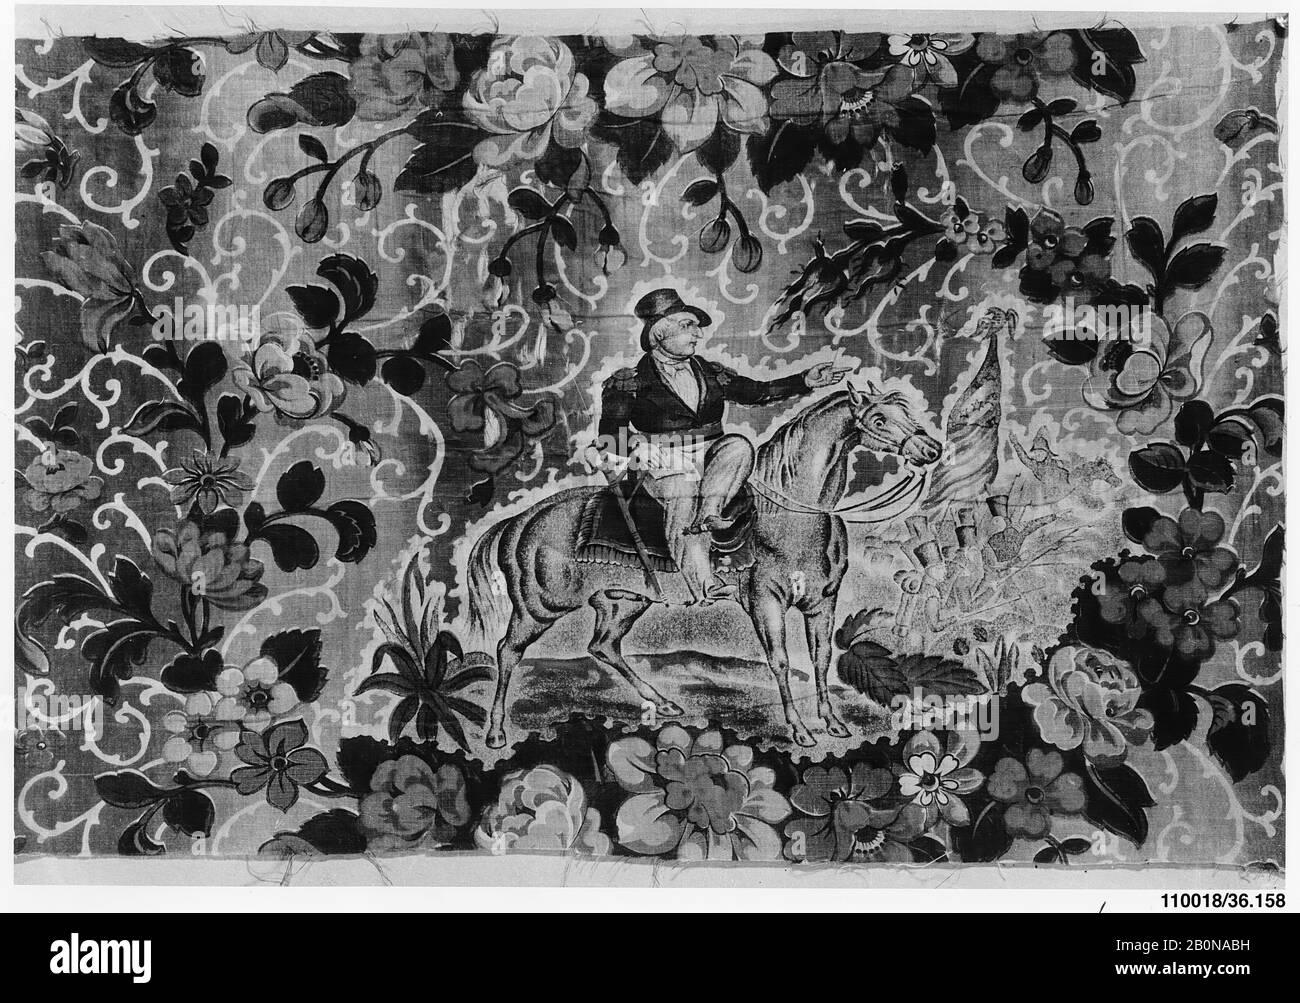 Stück, amerikanisch, ca. 25-48, amerikanisch, Baumwolle, graviert, Rollenbedruckt, 25 x 16 Zoll (63,5 x 40,6 cm), Textilien Stockfoto